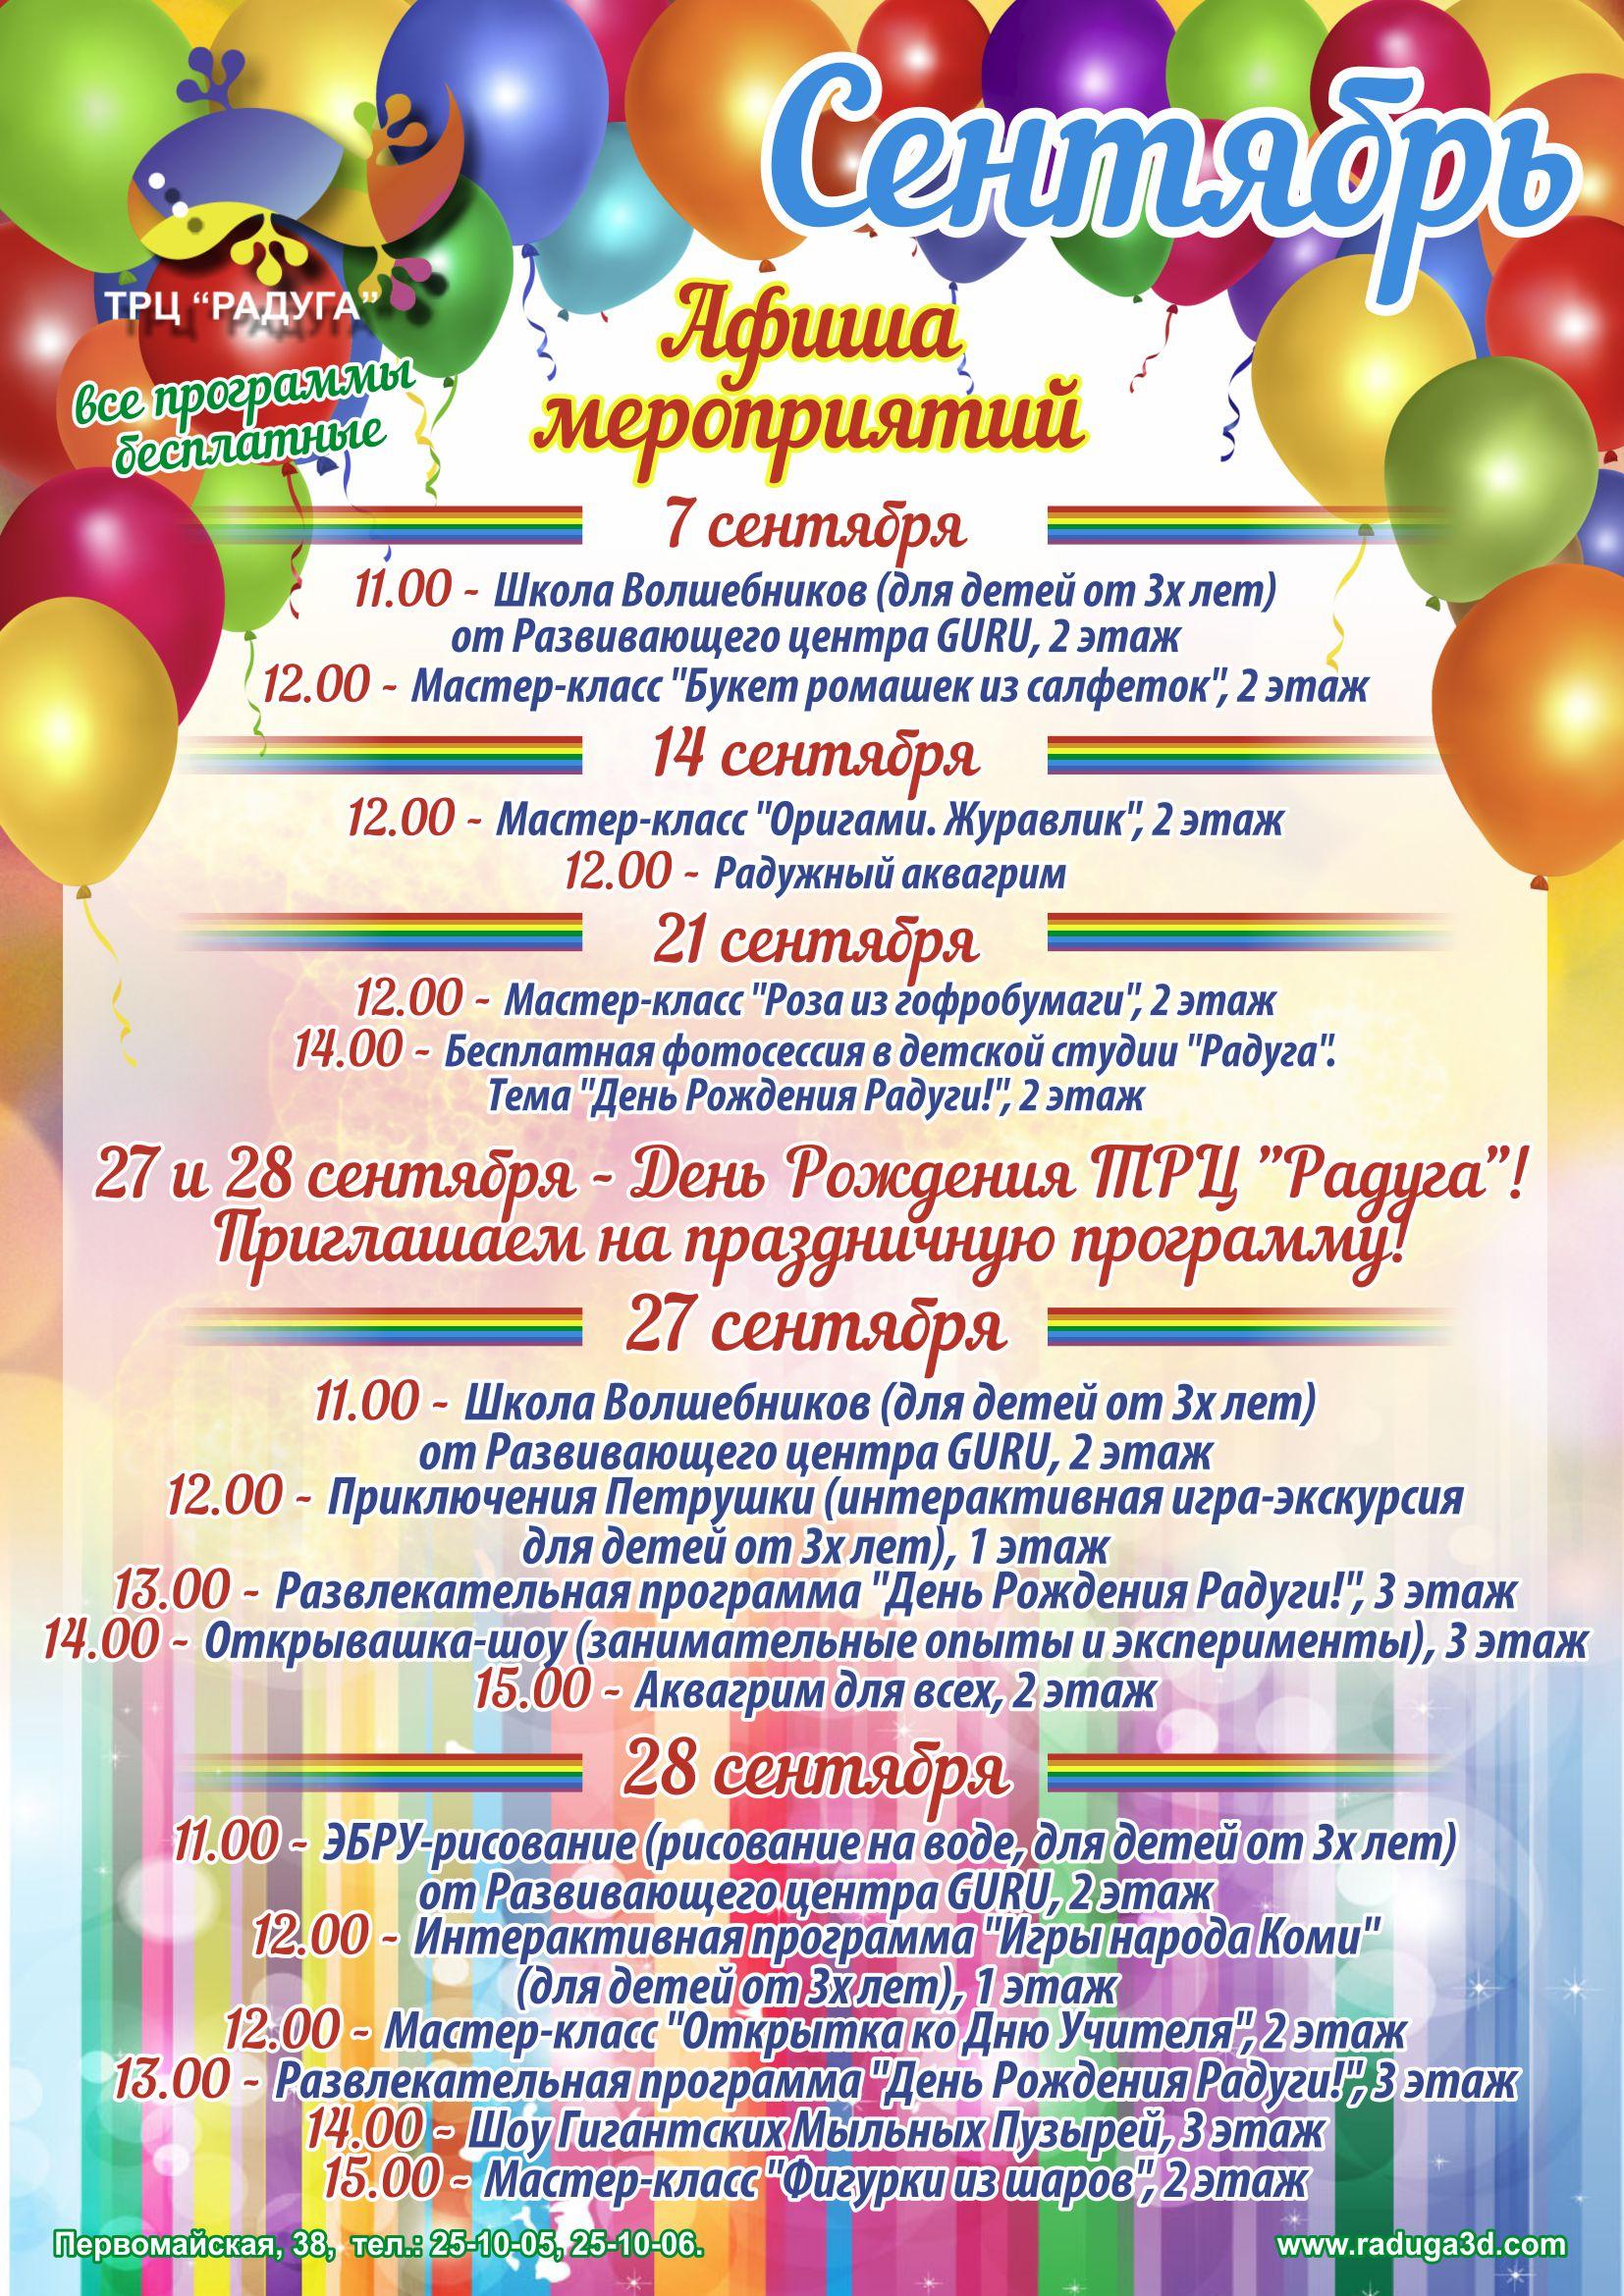 Программа мероприятий в ТРЦ «Радуга» на сентябрь!